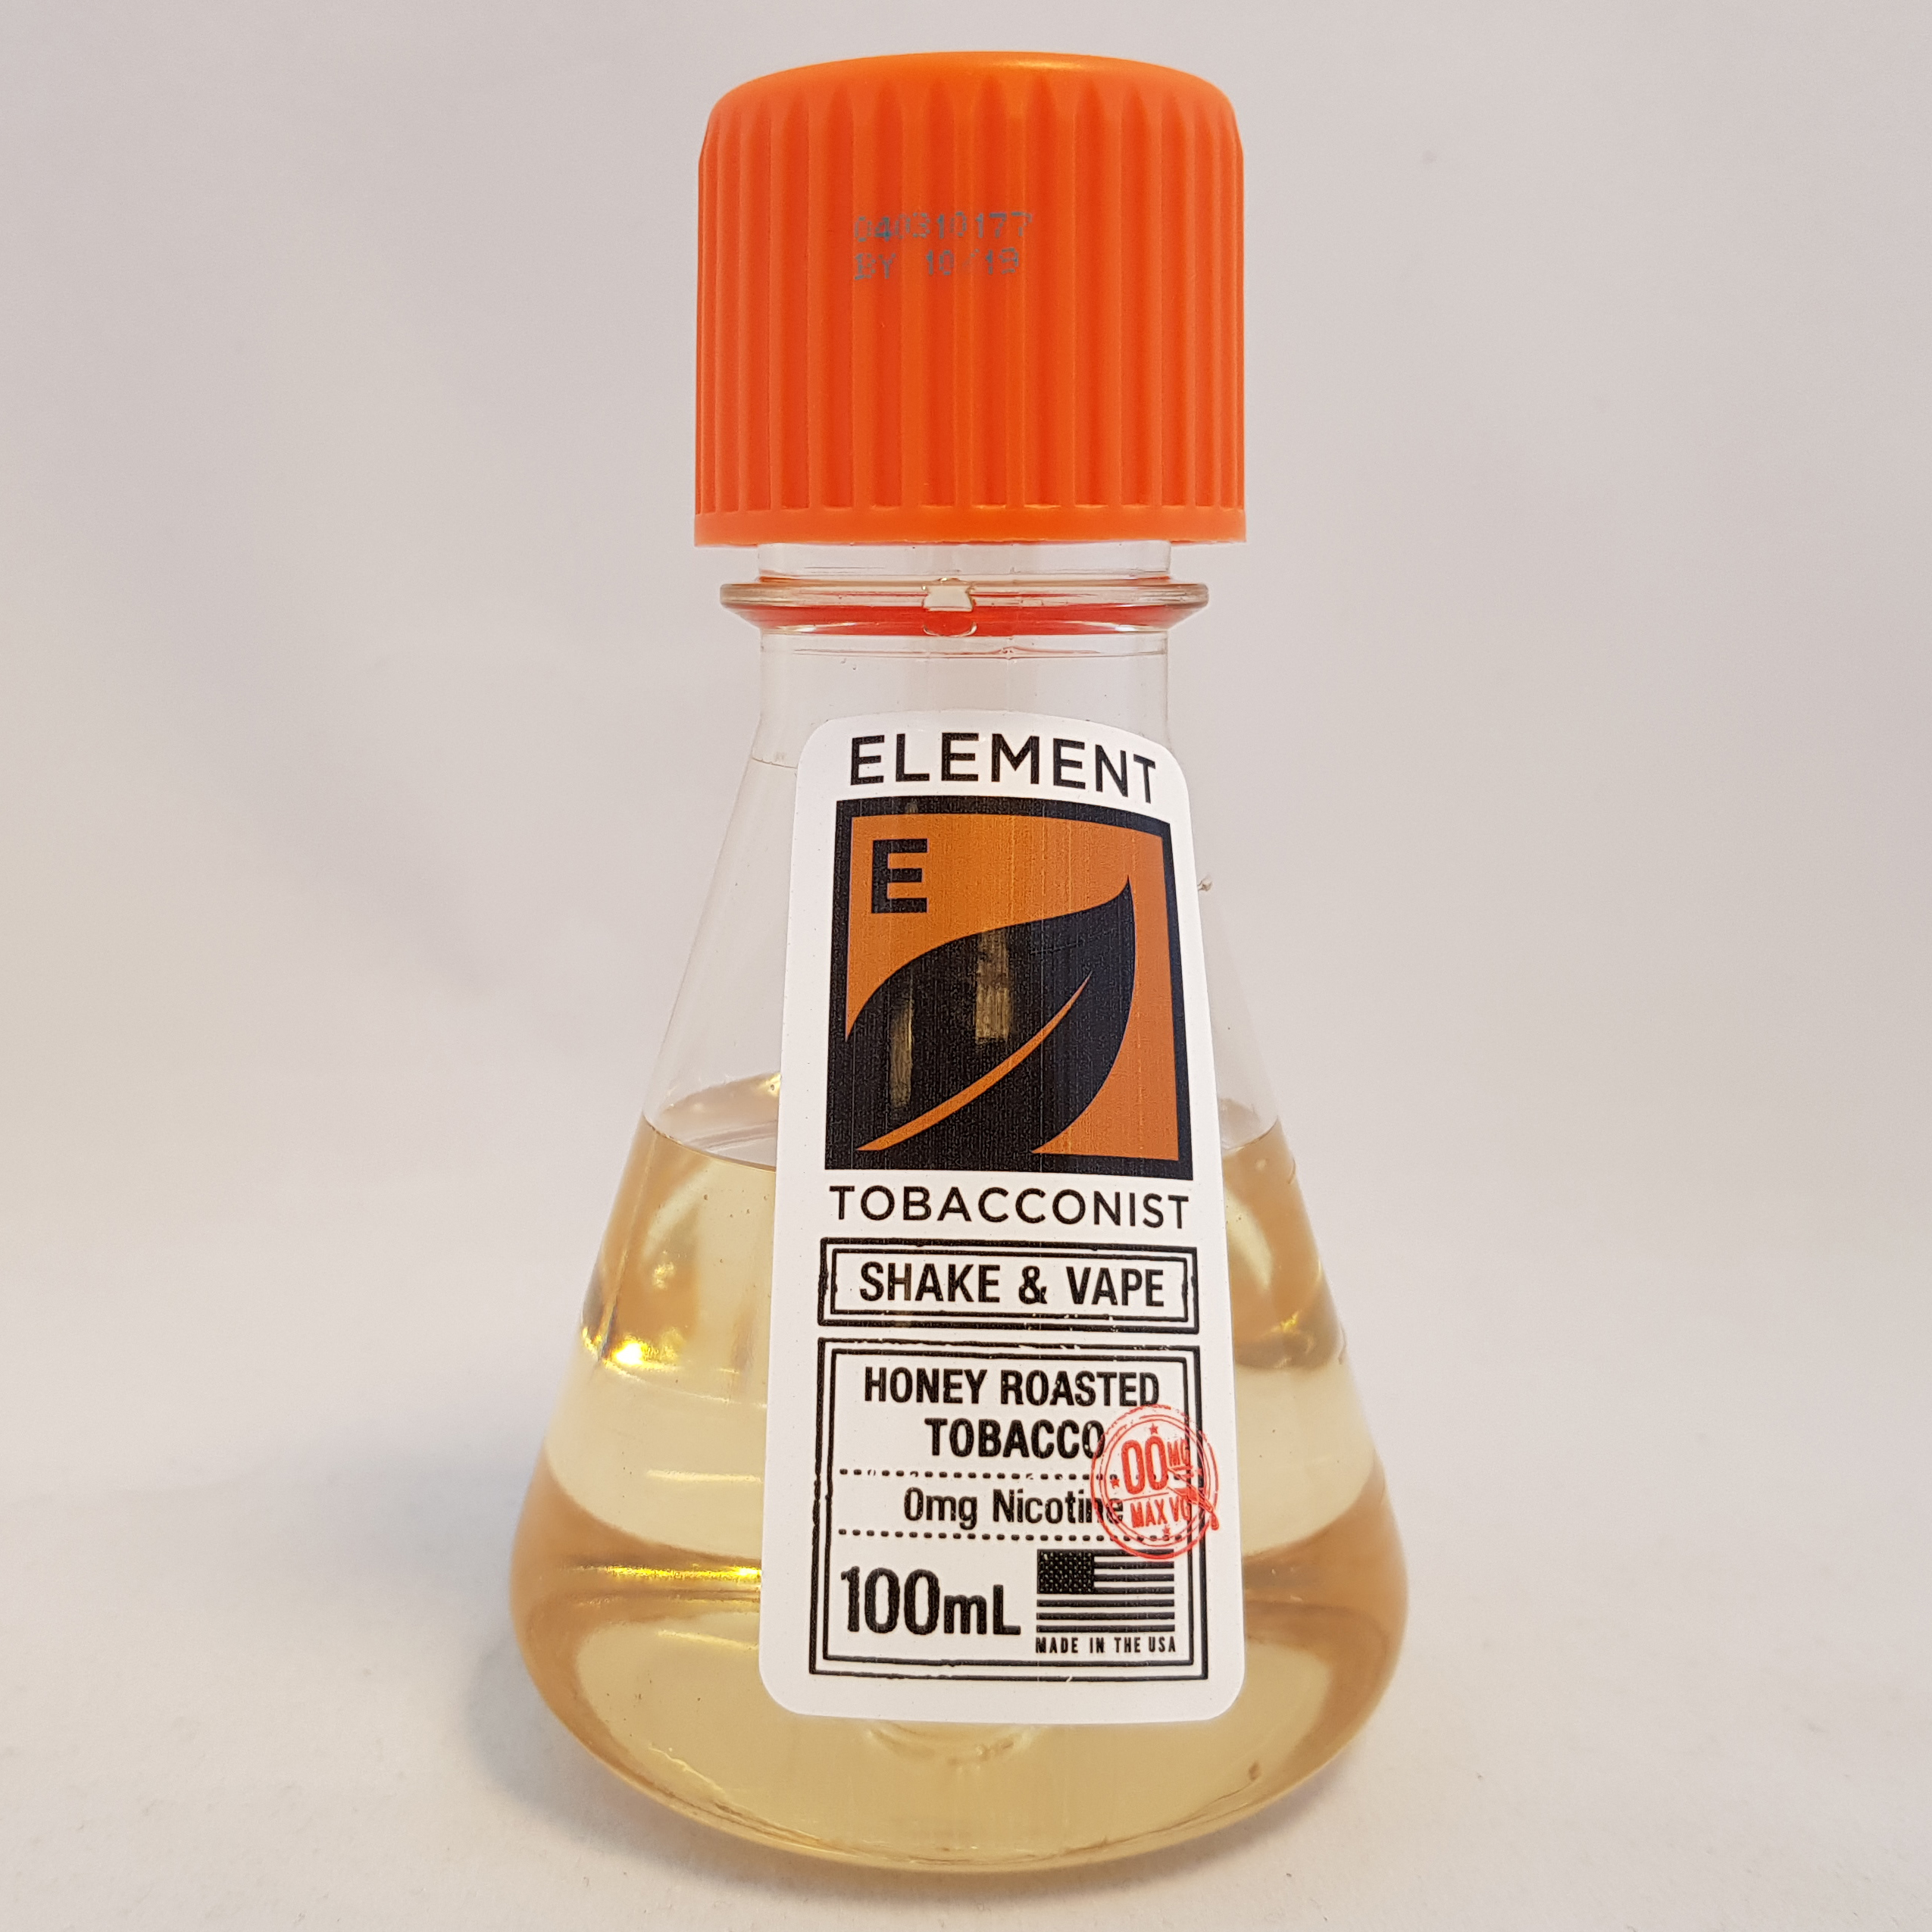 Element-honey-roasted-tobacco-100mL-flask